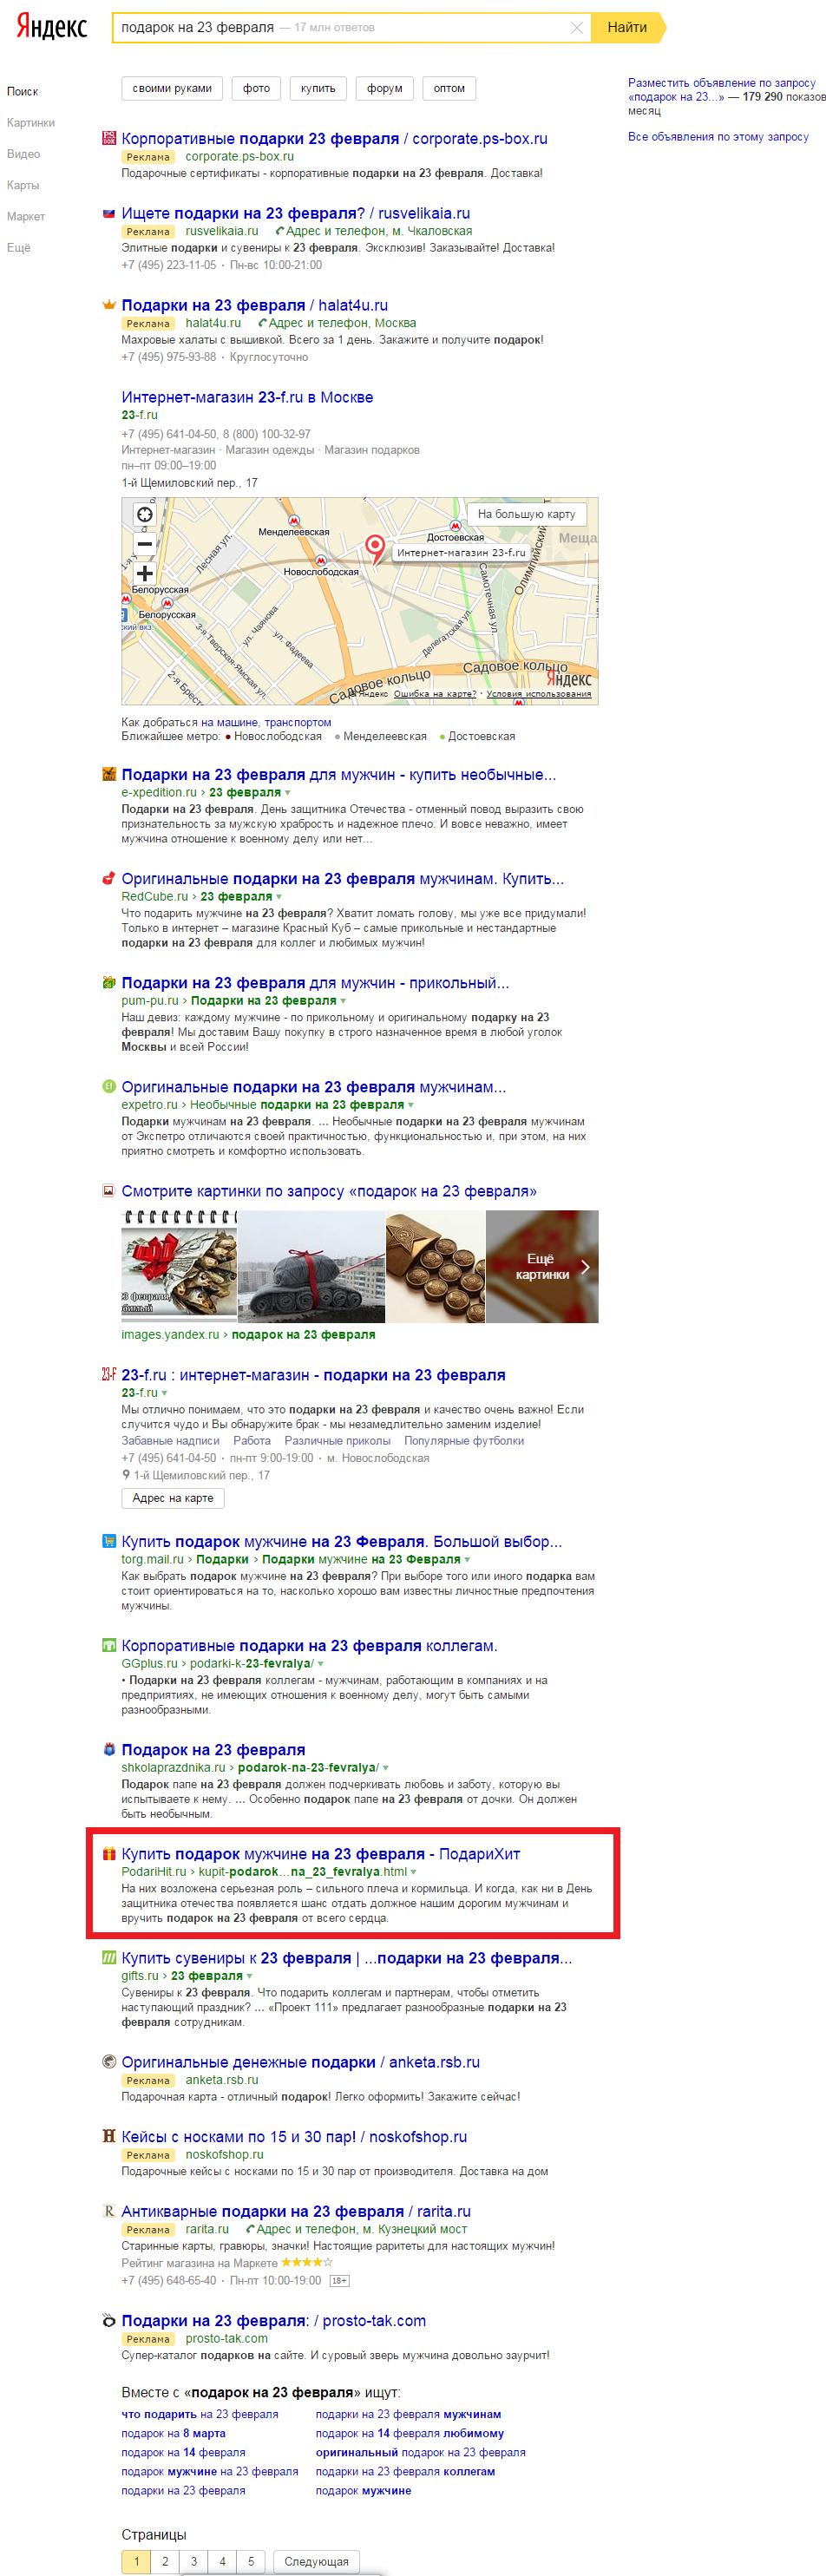 ПОДАРОК НА 23 ФЕВРАЛЯ - ТОП 10 Yandex (Москва)